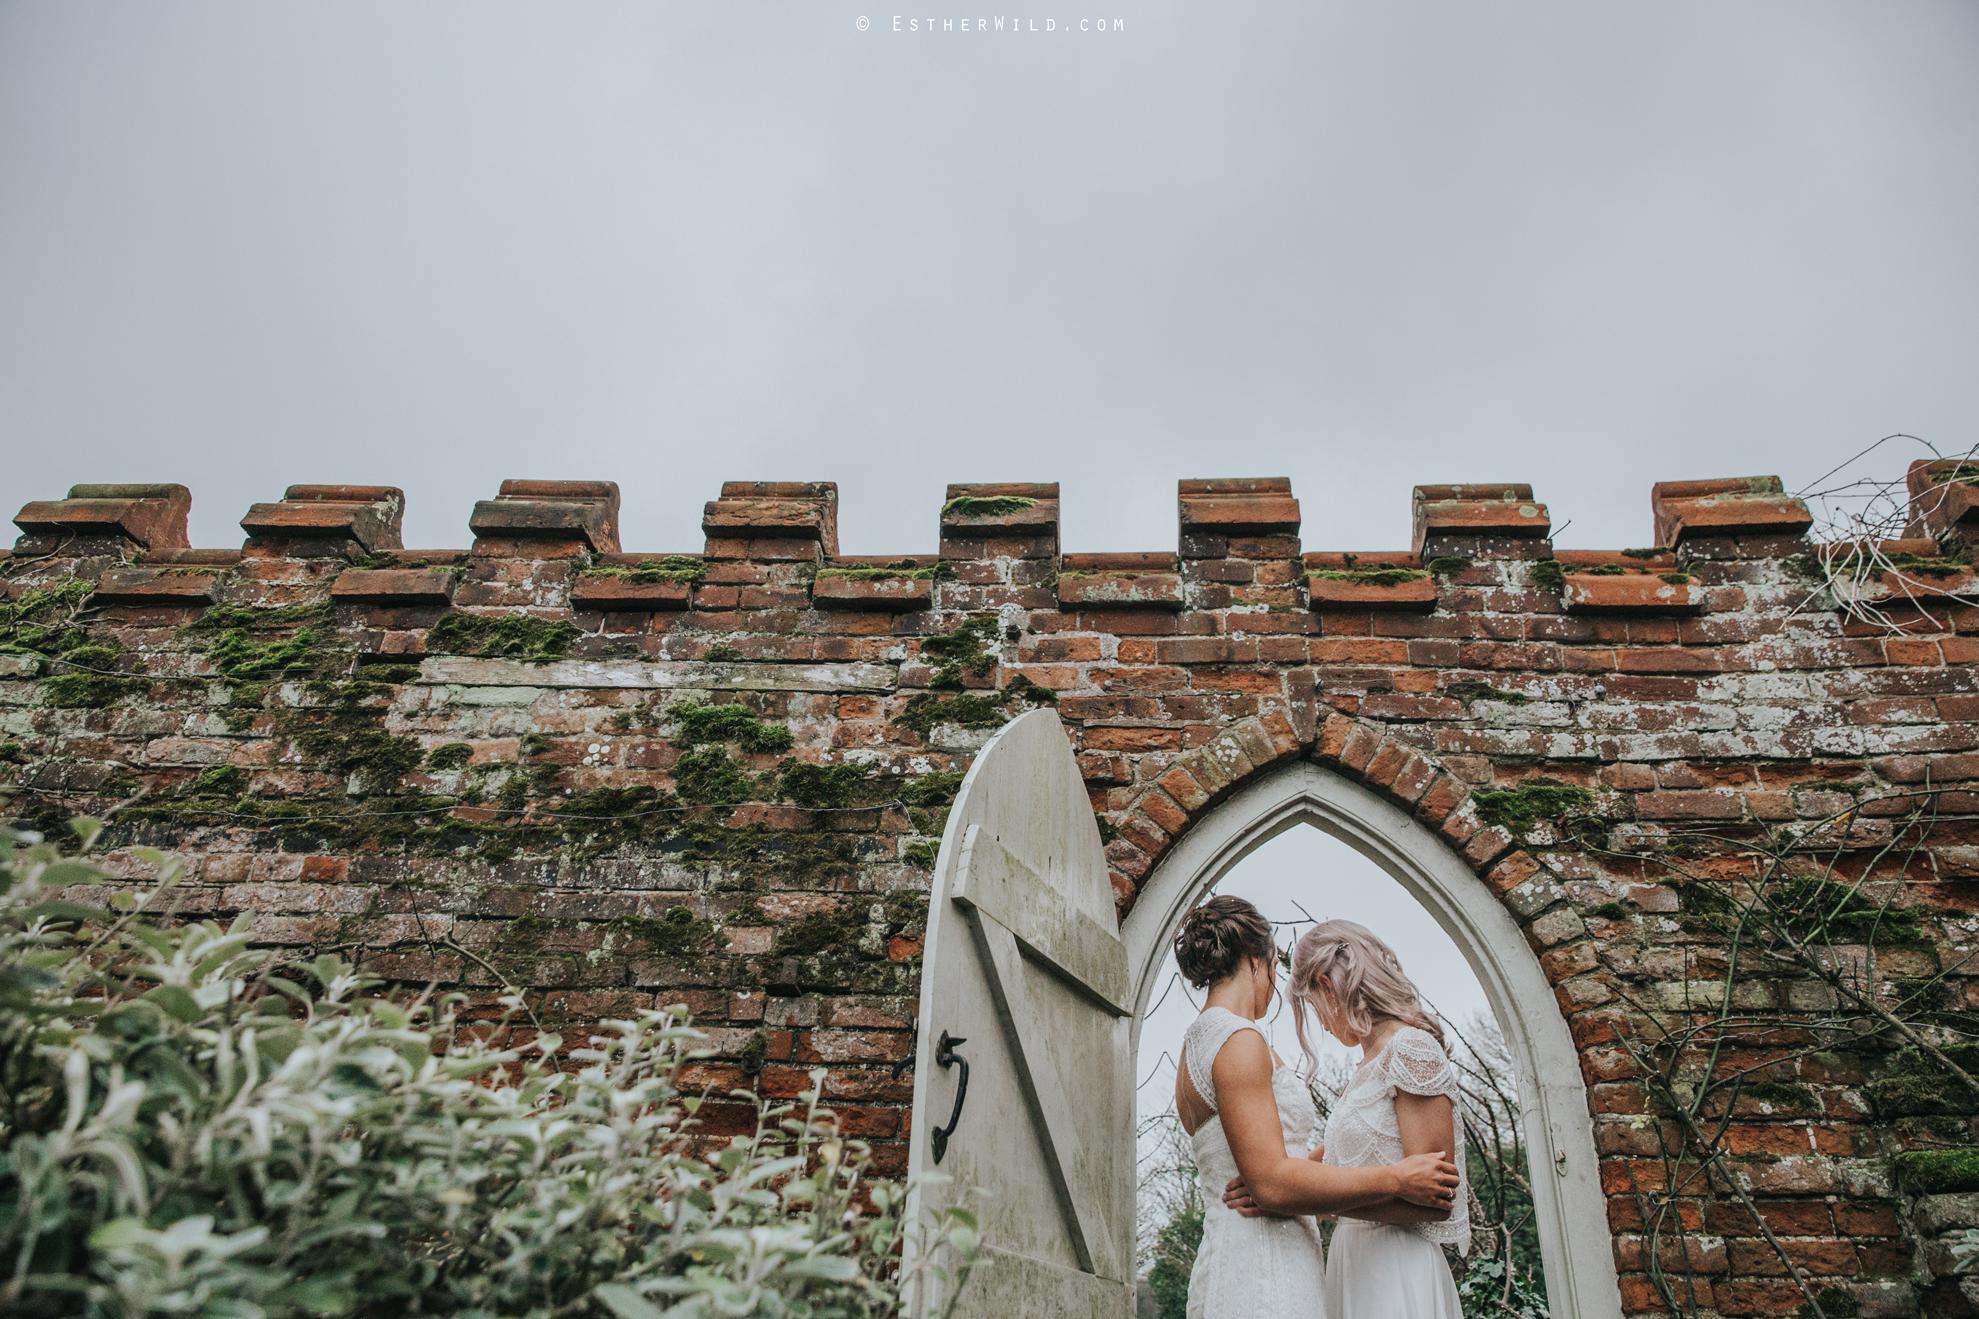 Elms_Barn_Weddings_Suffolk_Photographer_Copyright_Esther_Wild_IMG_1928.jpg